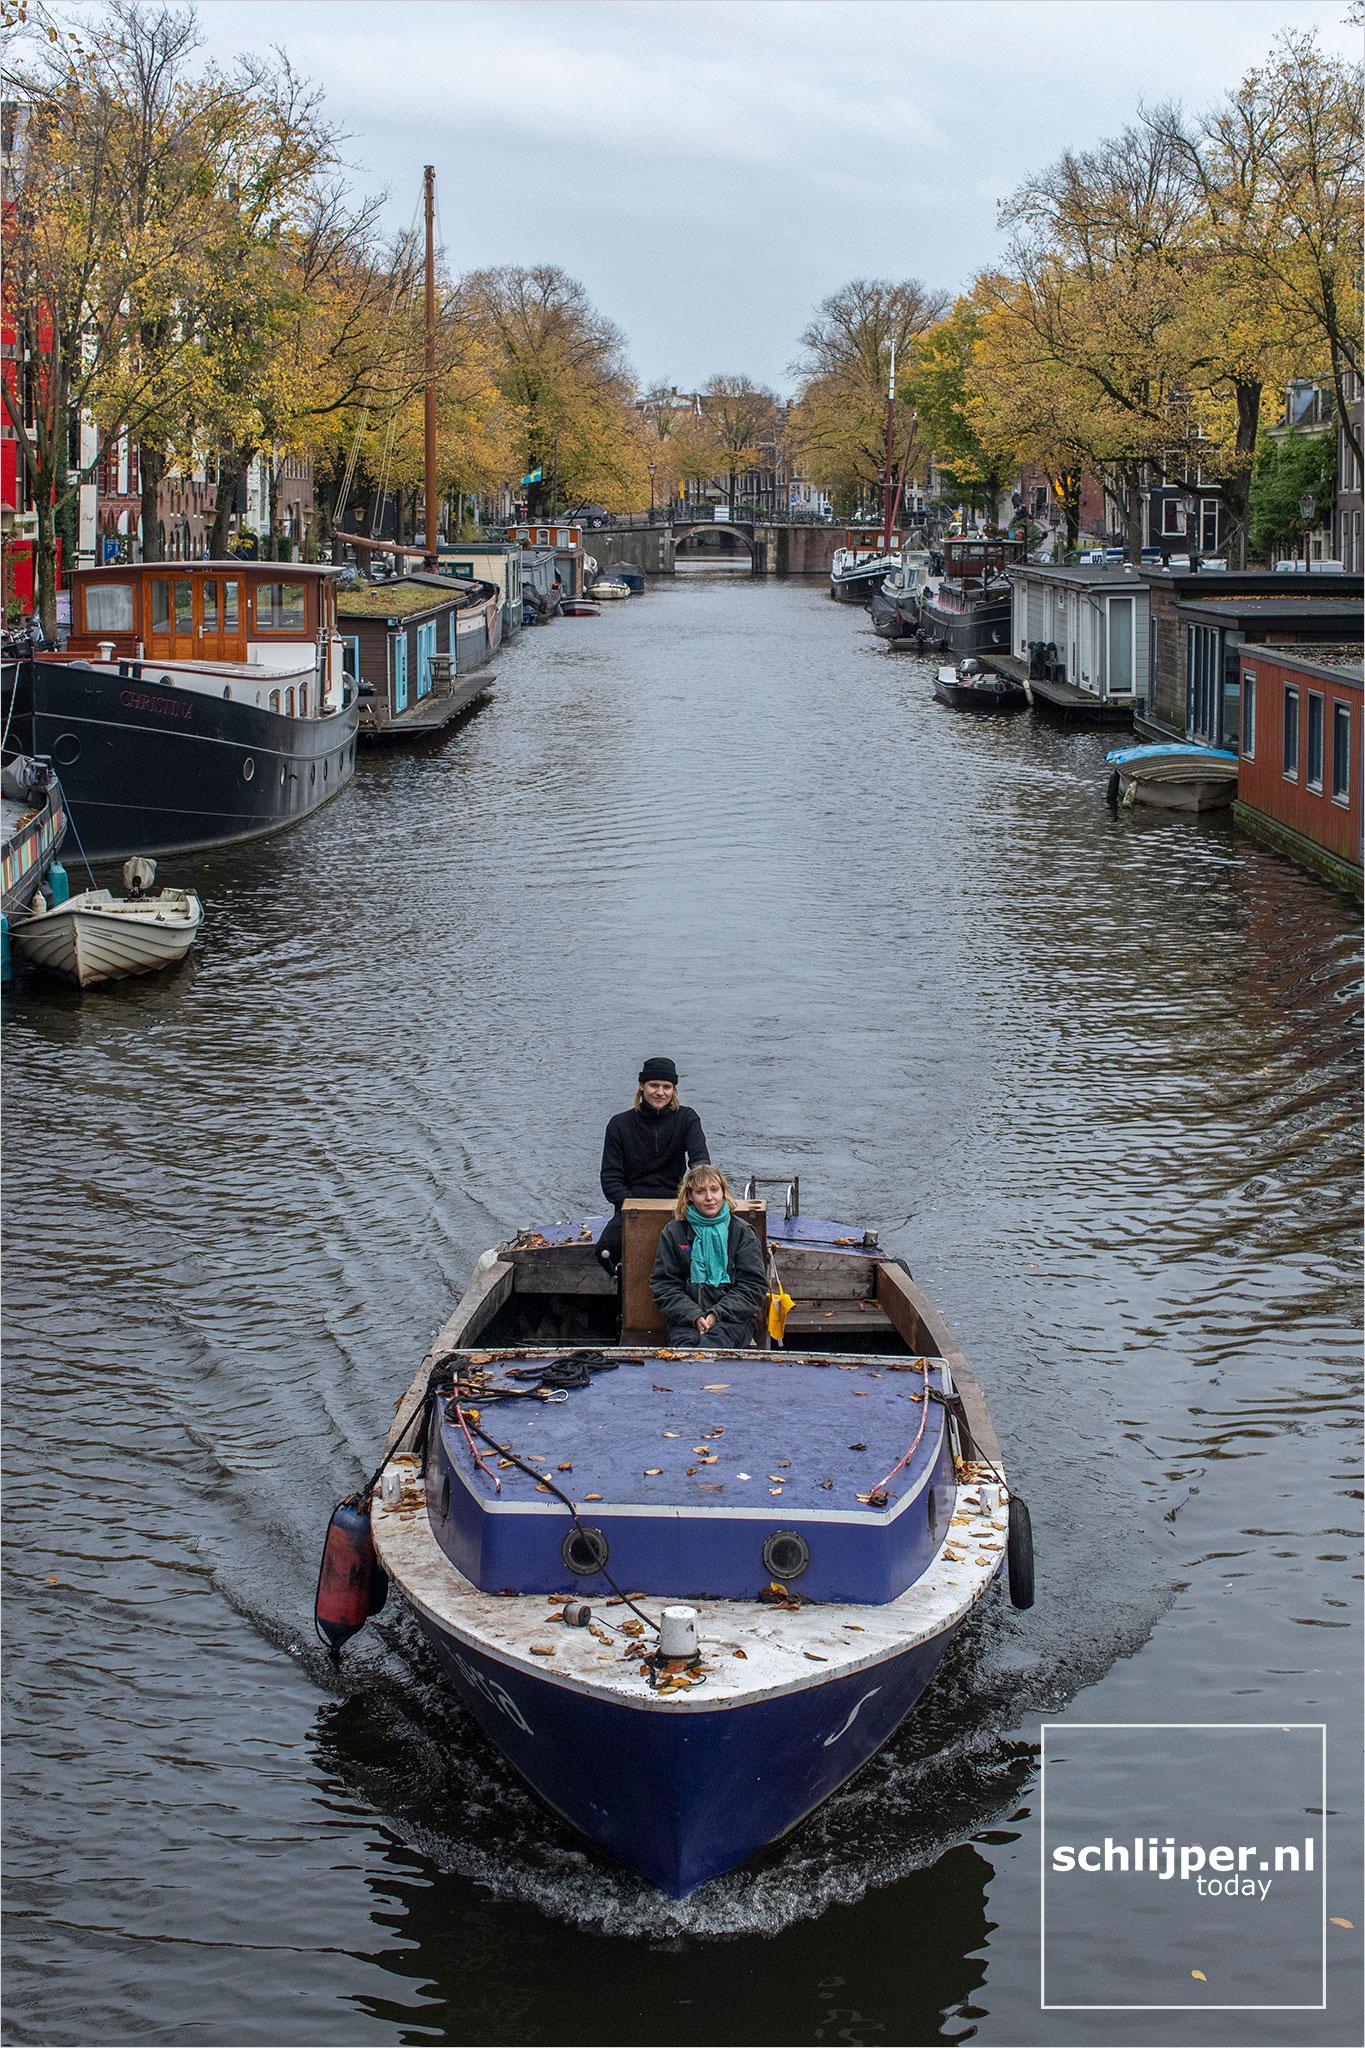 Nederland, Amsterdam, 27 oktober 2020